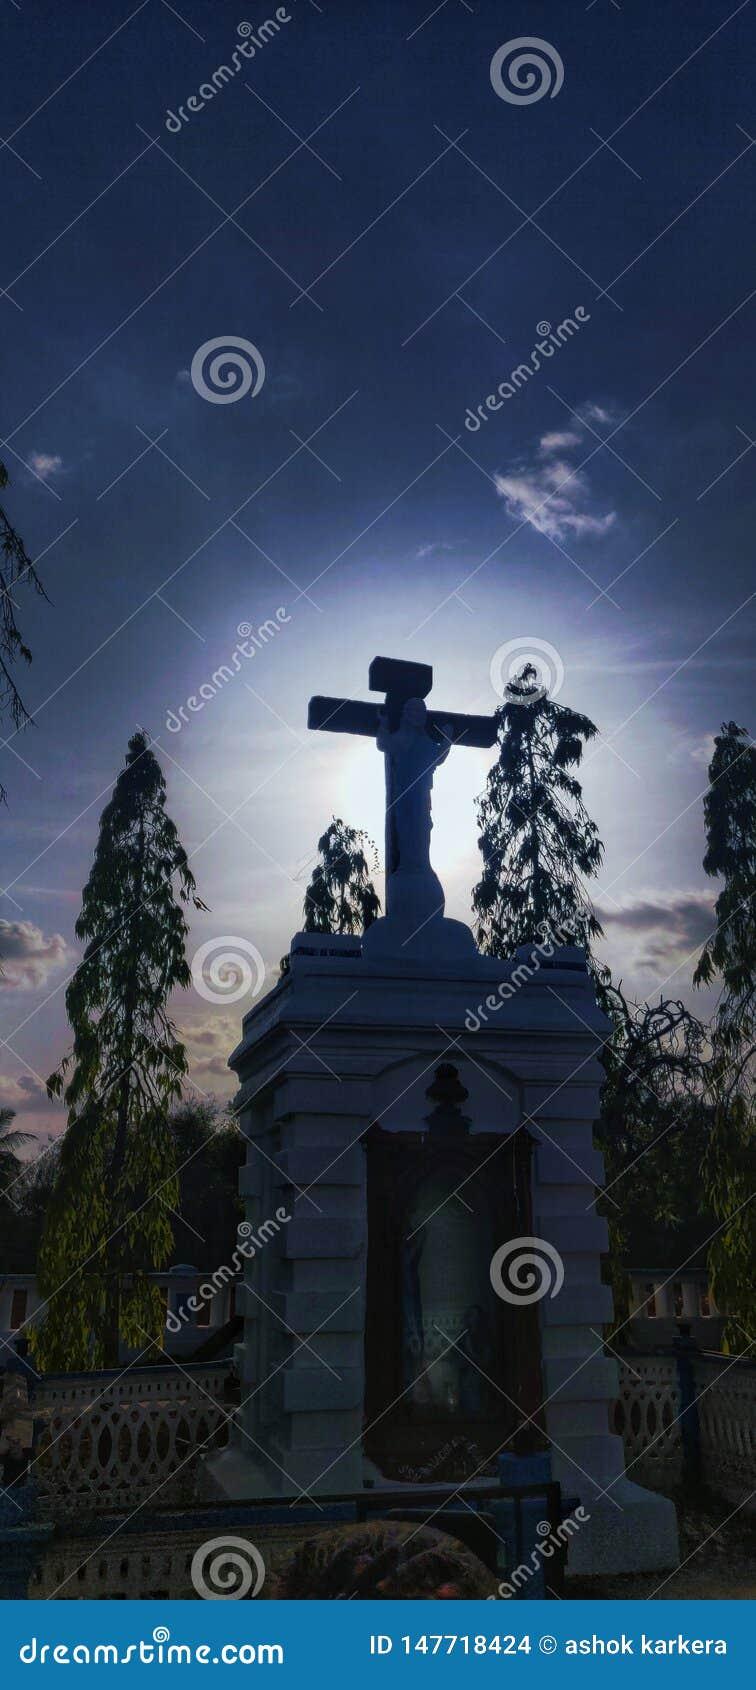 Goa divar ö, kors, Jesus, kyrka, solljus,